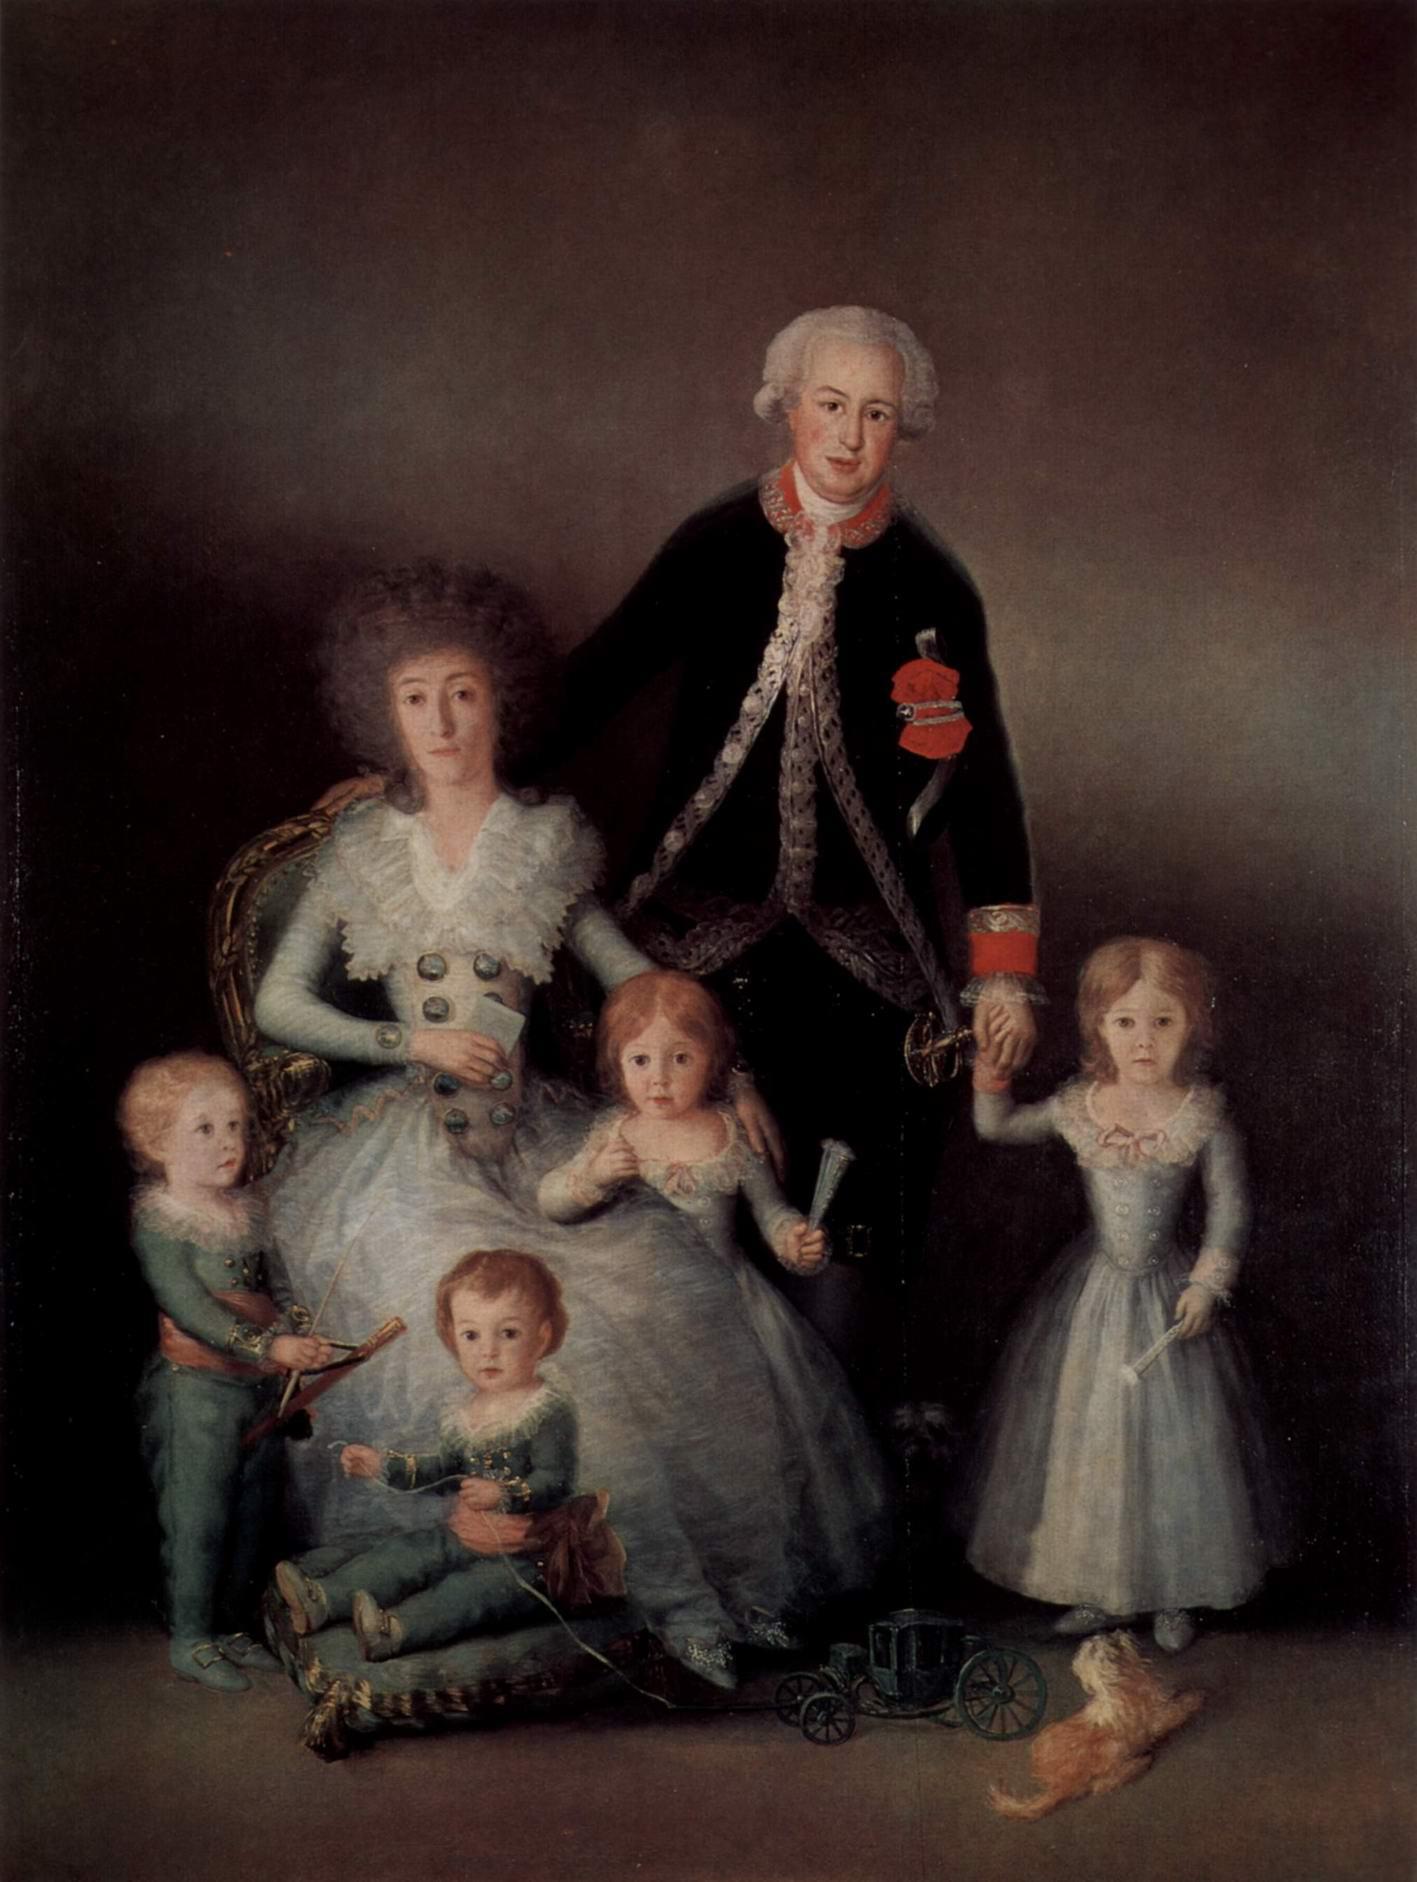 Семейство герцога Осунского, Франсиско де Гойя-и-Лусьентес